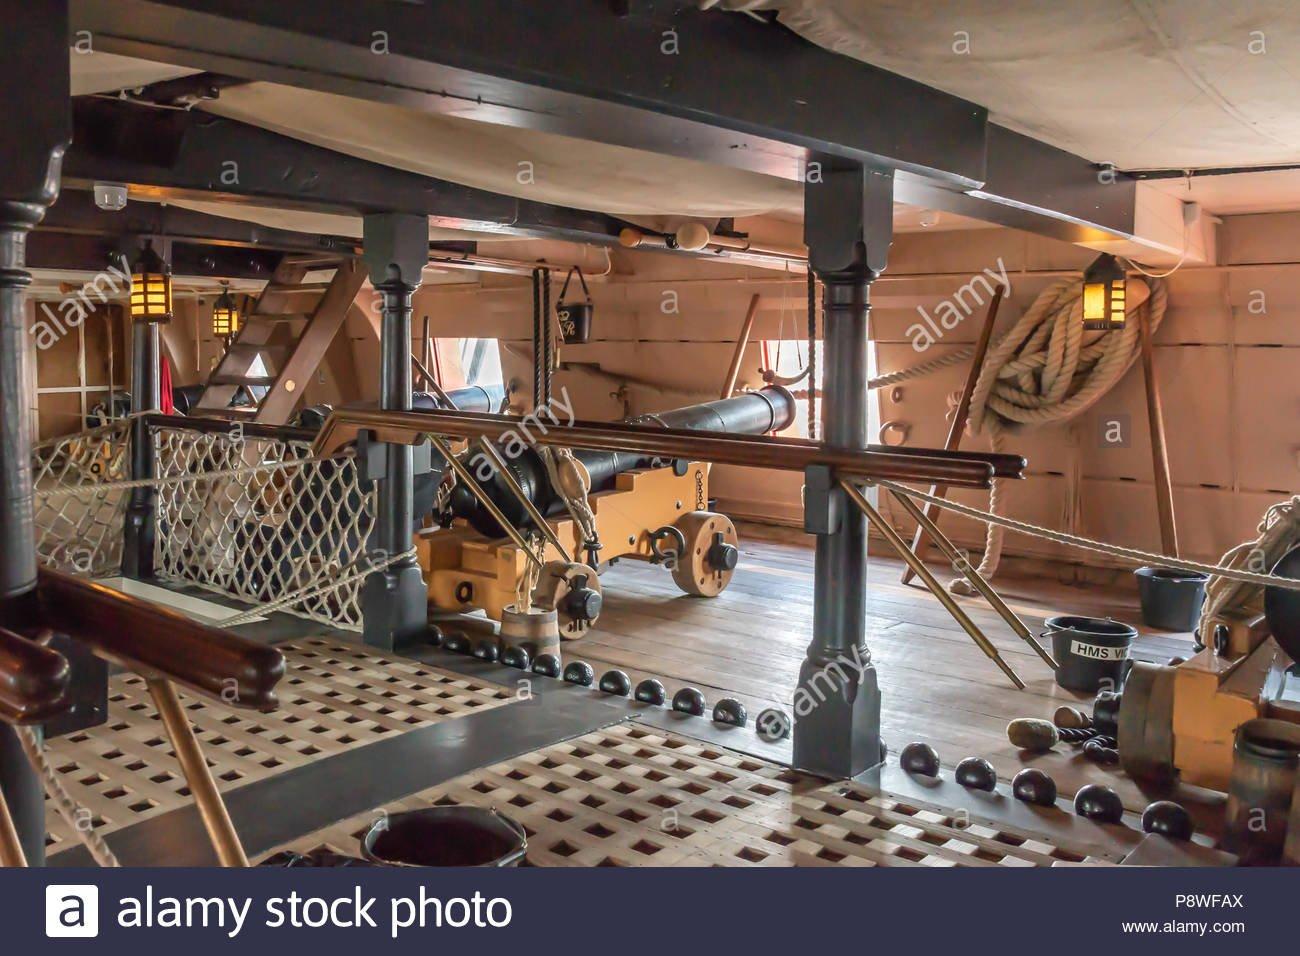 hms-victory-gun-deck-portsmouth-P8WFAX.jpg.6bf15bdc8fe7c6940e50ea555b217491.jpg